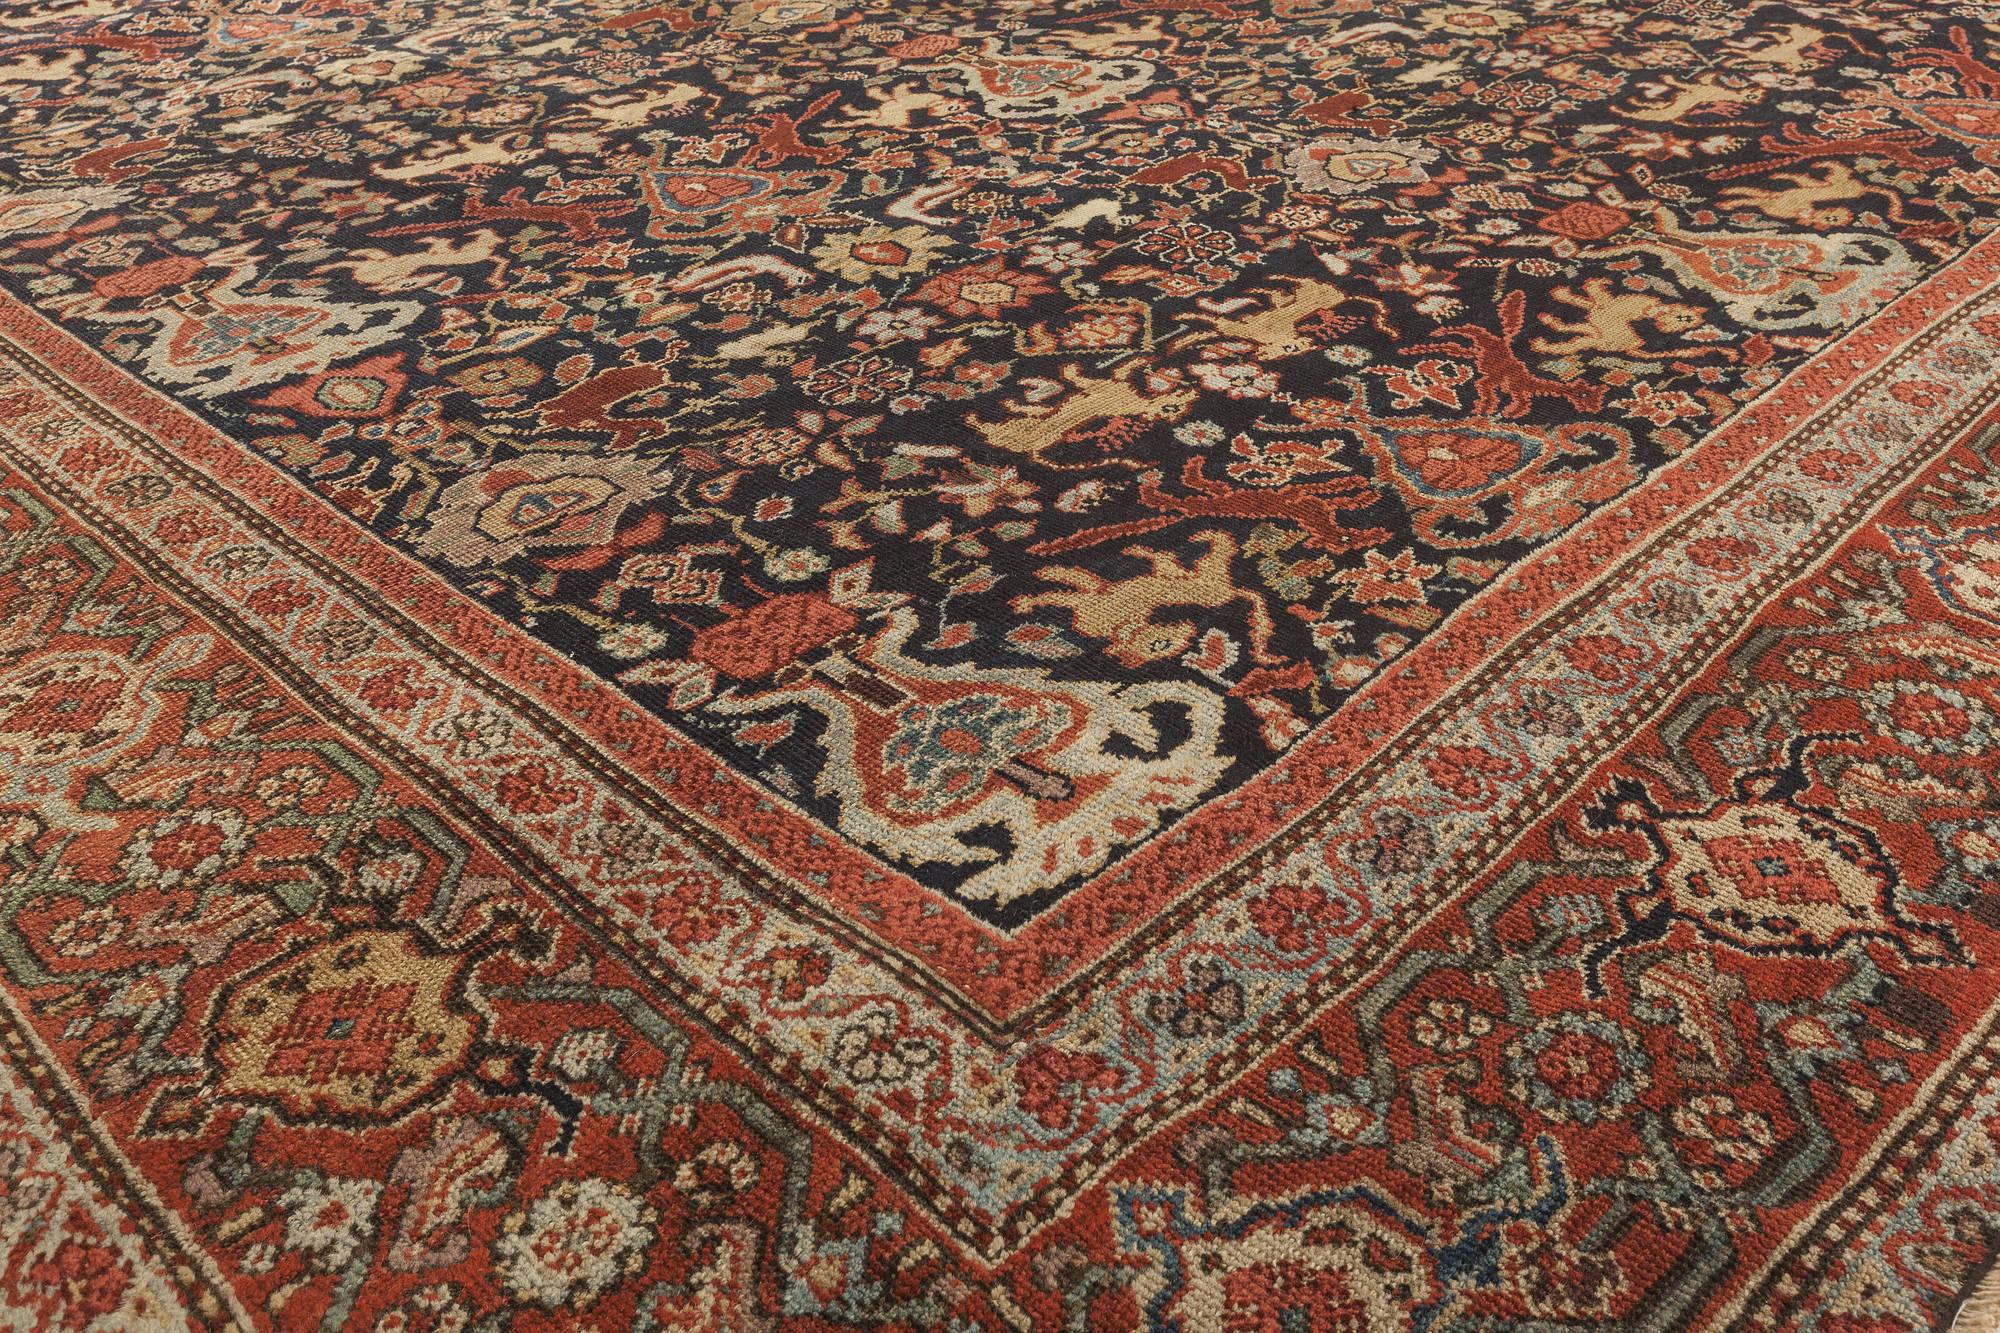 Antique Persian Feraghan Rug Bb6310 By Doris Leslie Blau